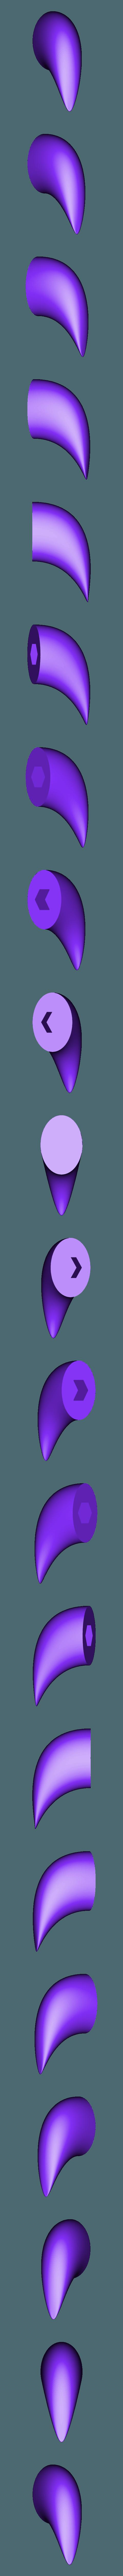 Beak_Tip.stl Download free STL file Rainbow Toucan • 3D printing template, 3rdesignworks